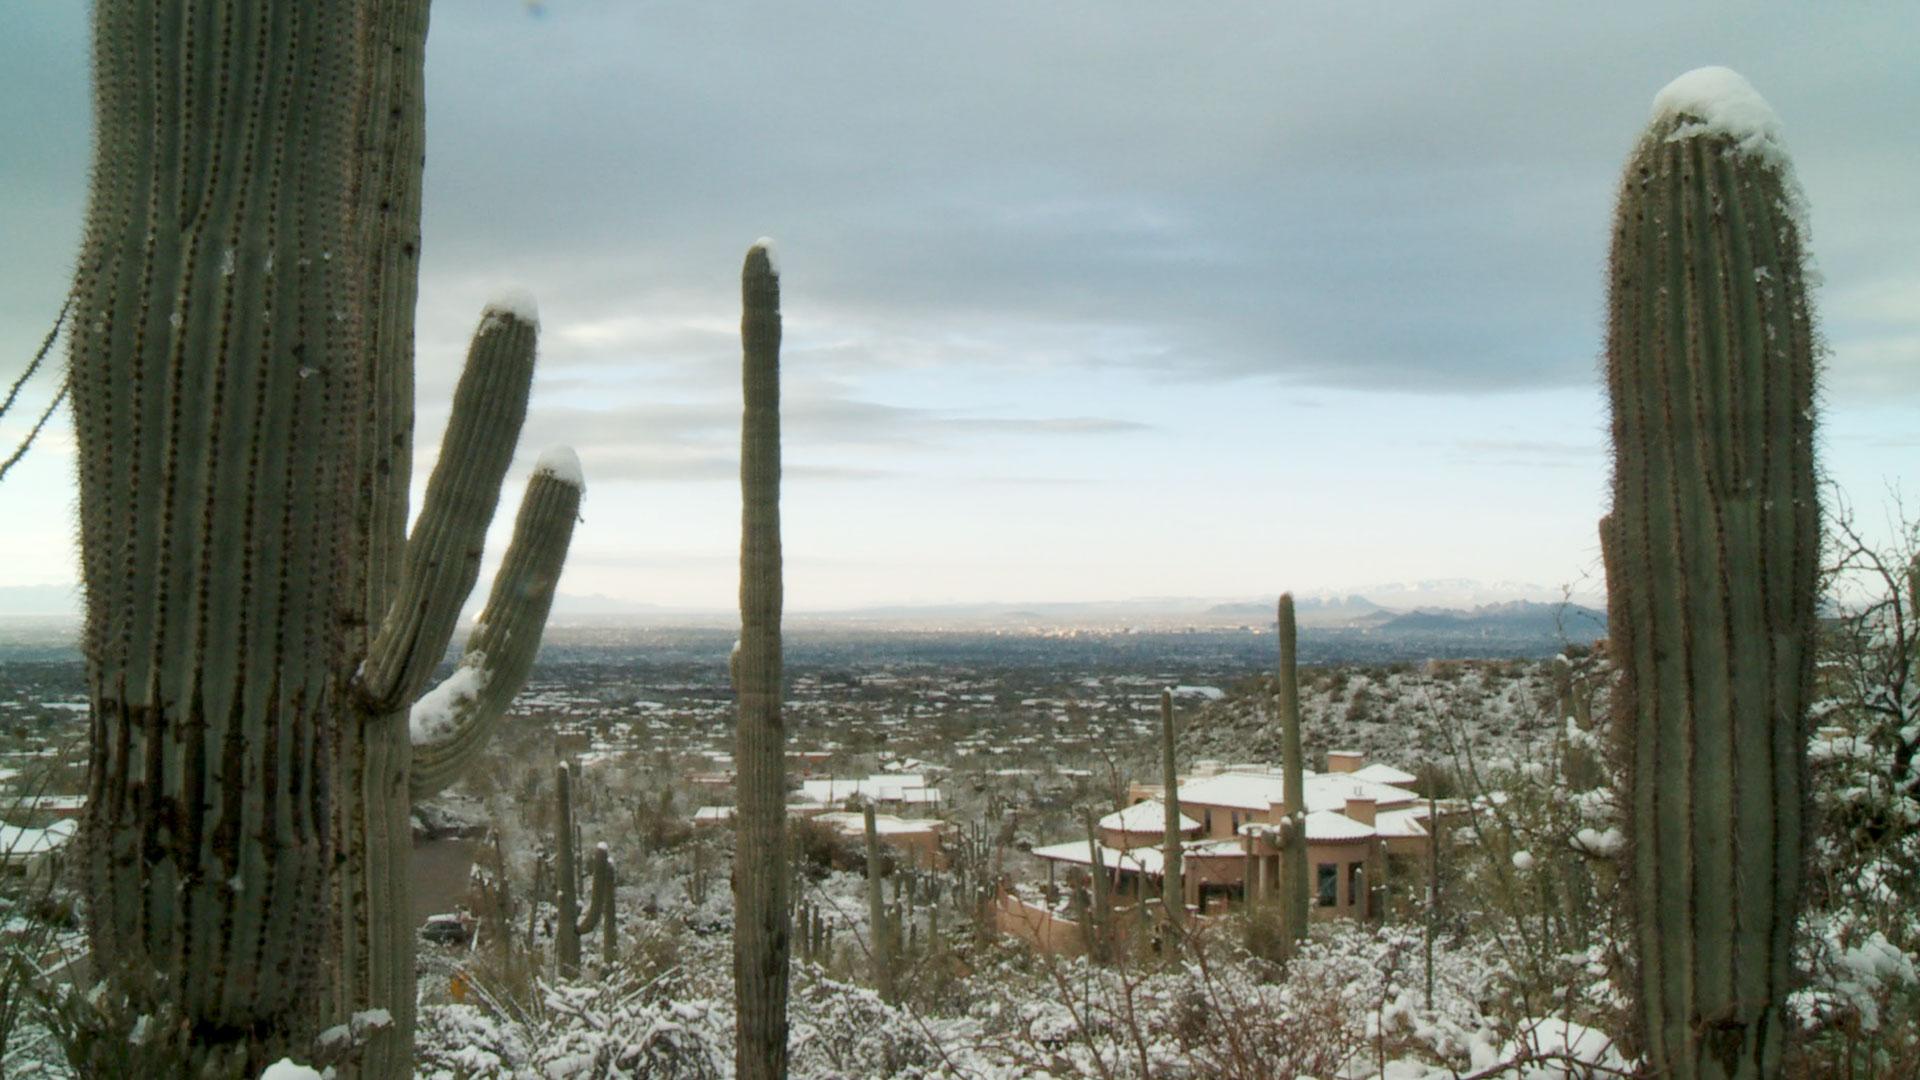 Tucson snowfall on the Finger Rock Trailhead, 2015.